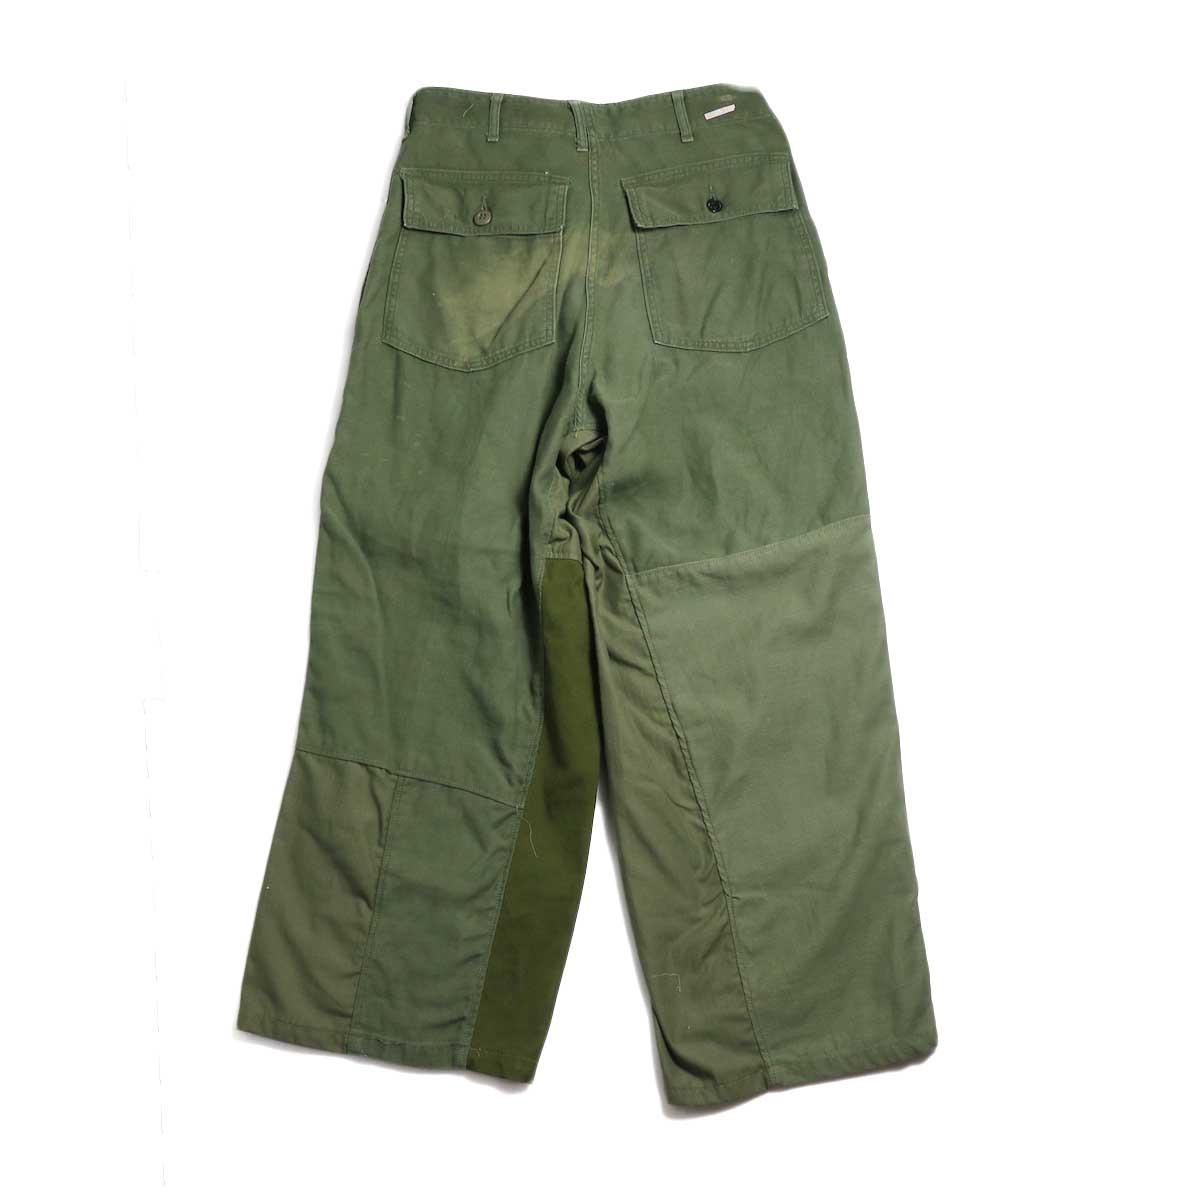 BONUM / Military FAT Pants (A) 背面